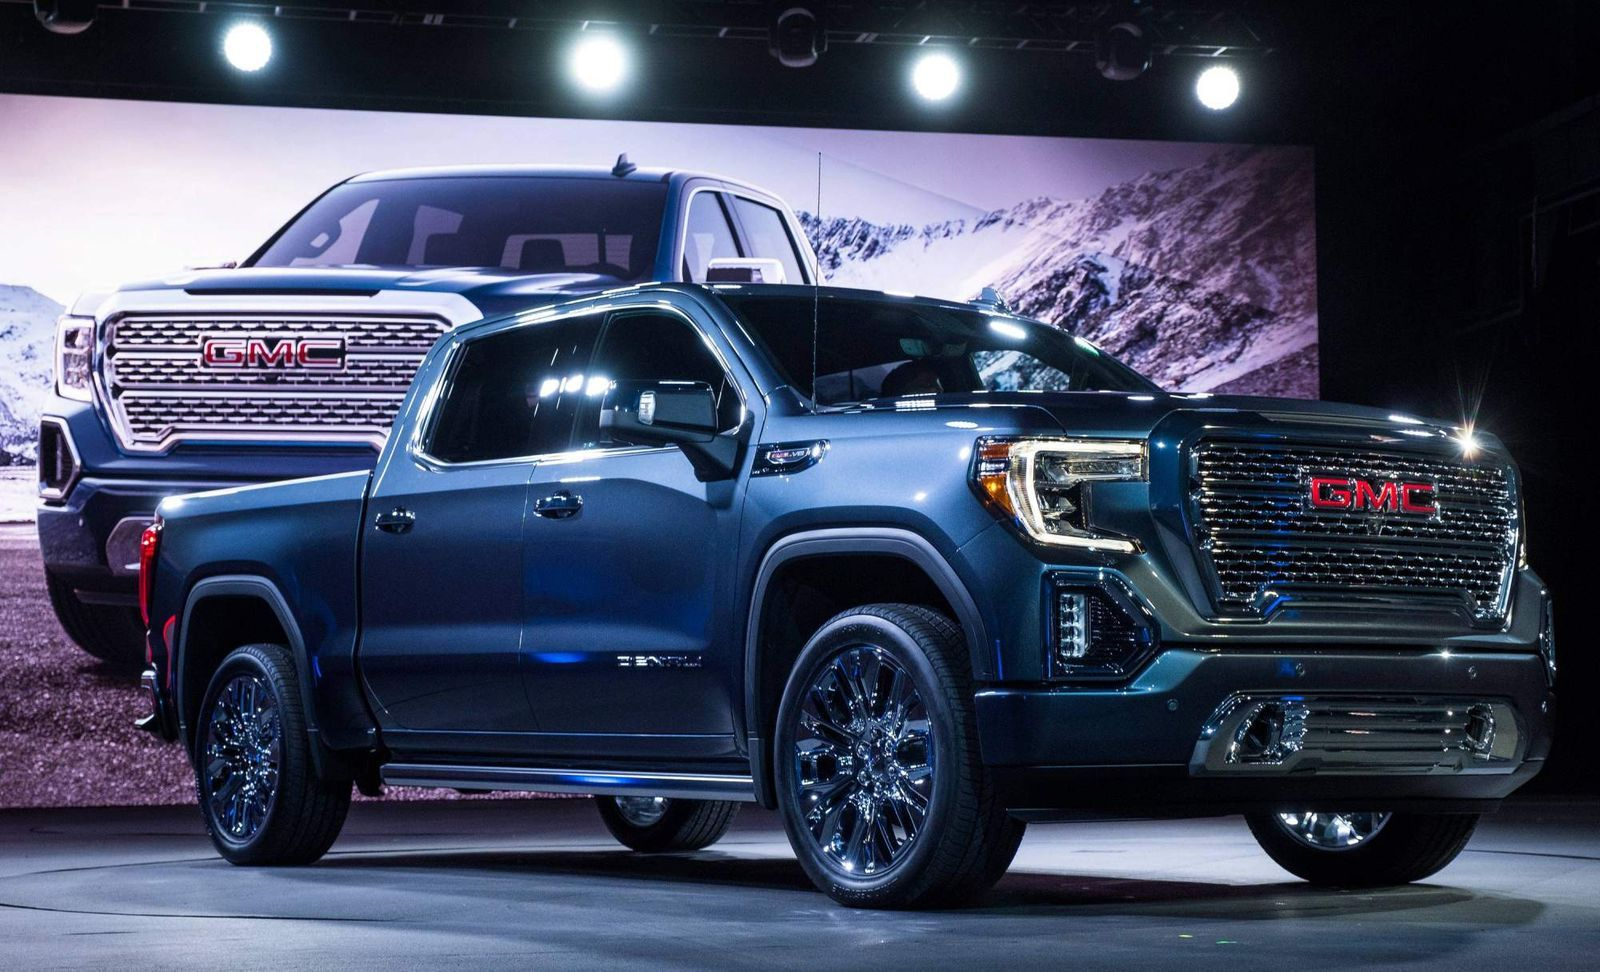 All New 2019 Gmc Sierra Is 360 Lb Lighter Debuts Carbon Fiber Bed In 2020 Gmc Sierra Denali Gmc Trucks Gmc Vehicles